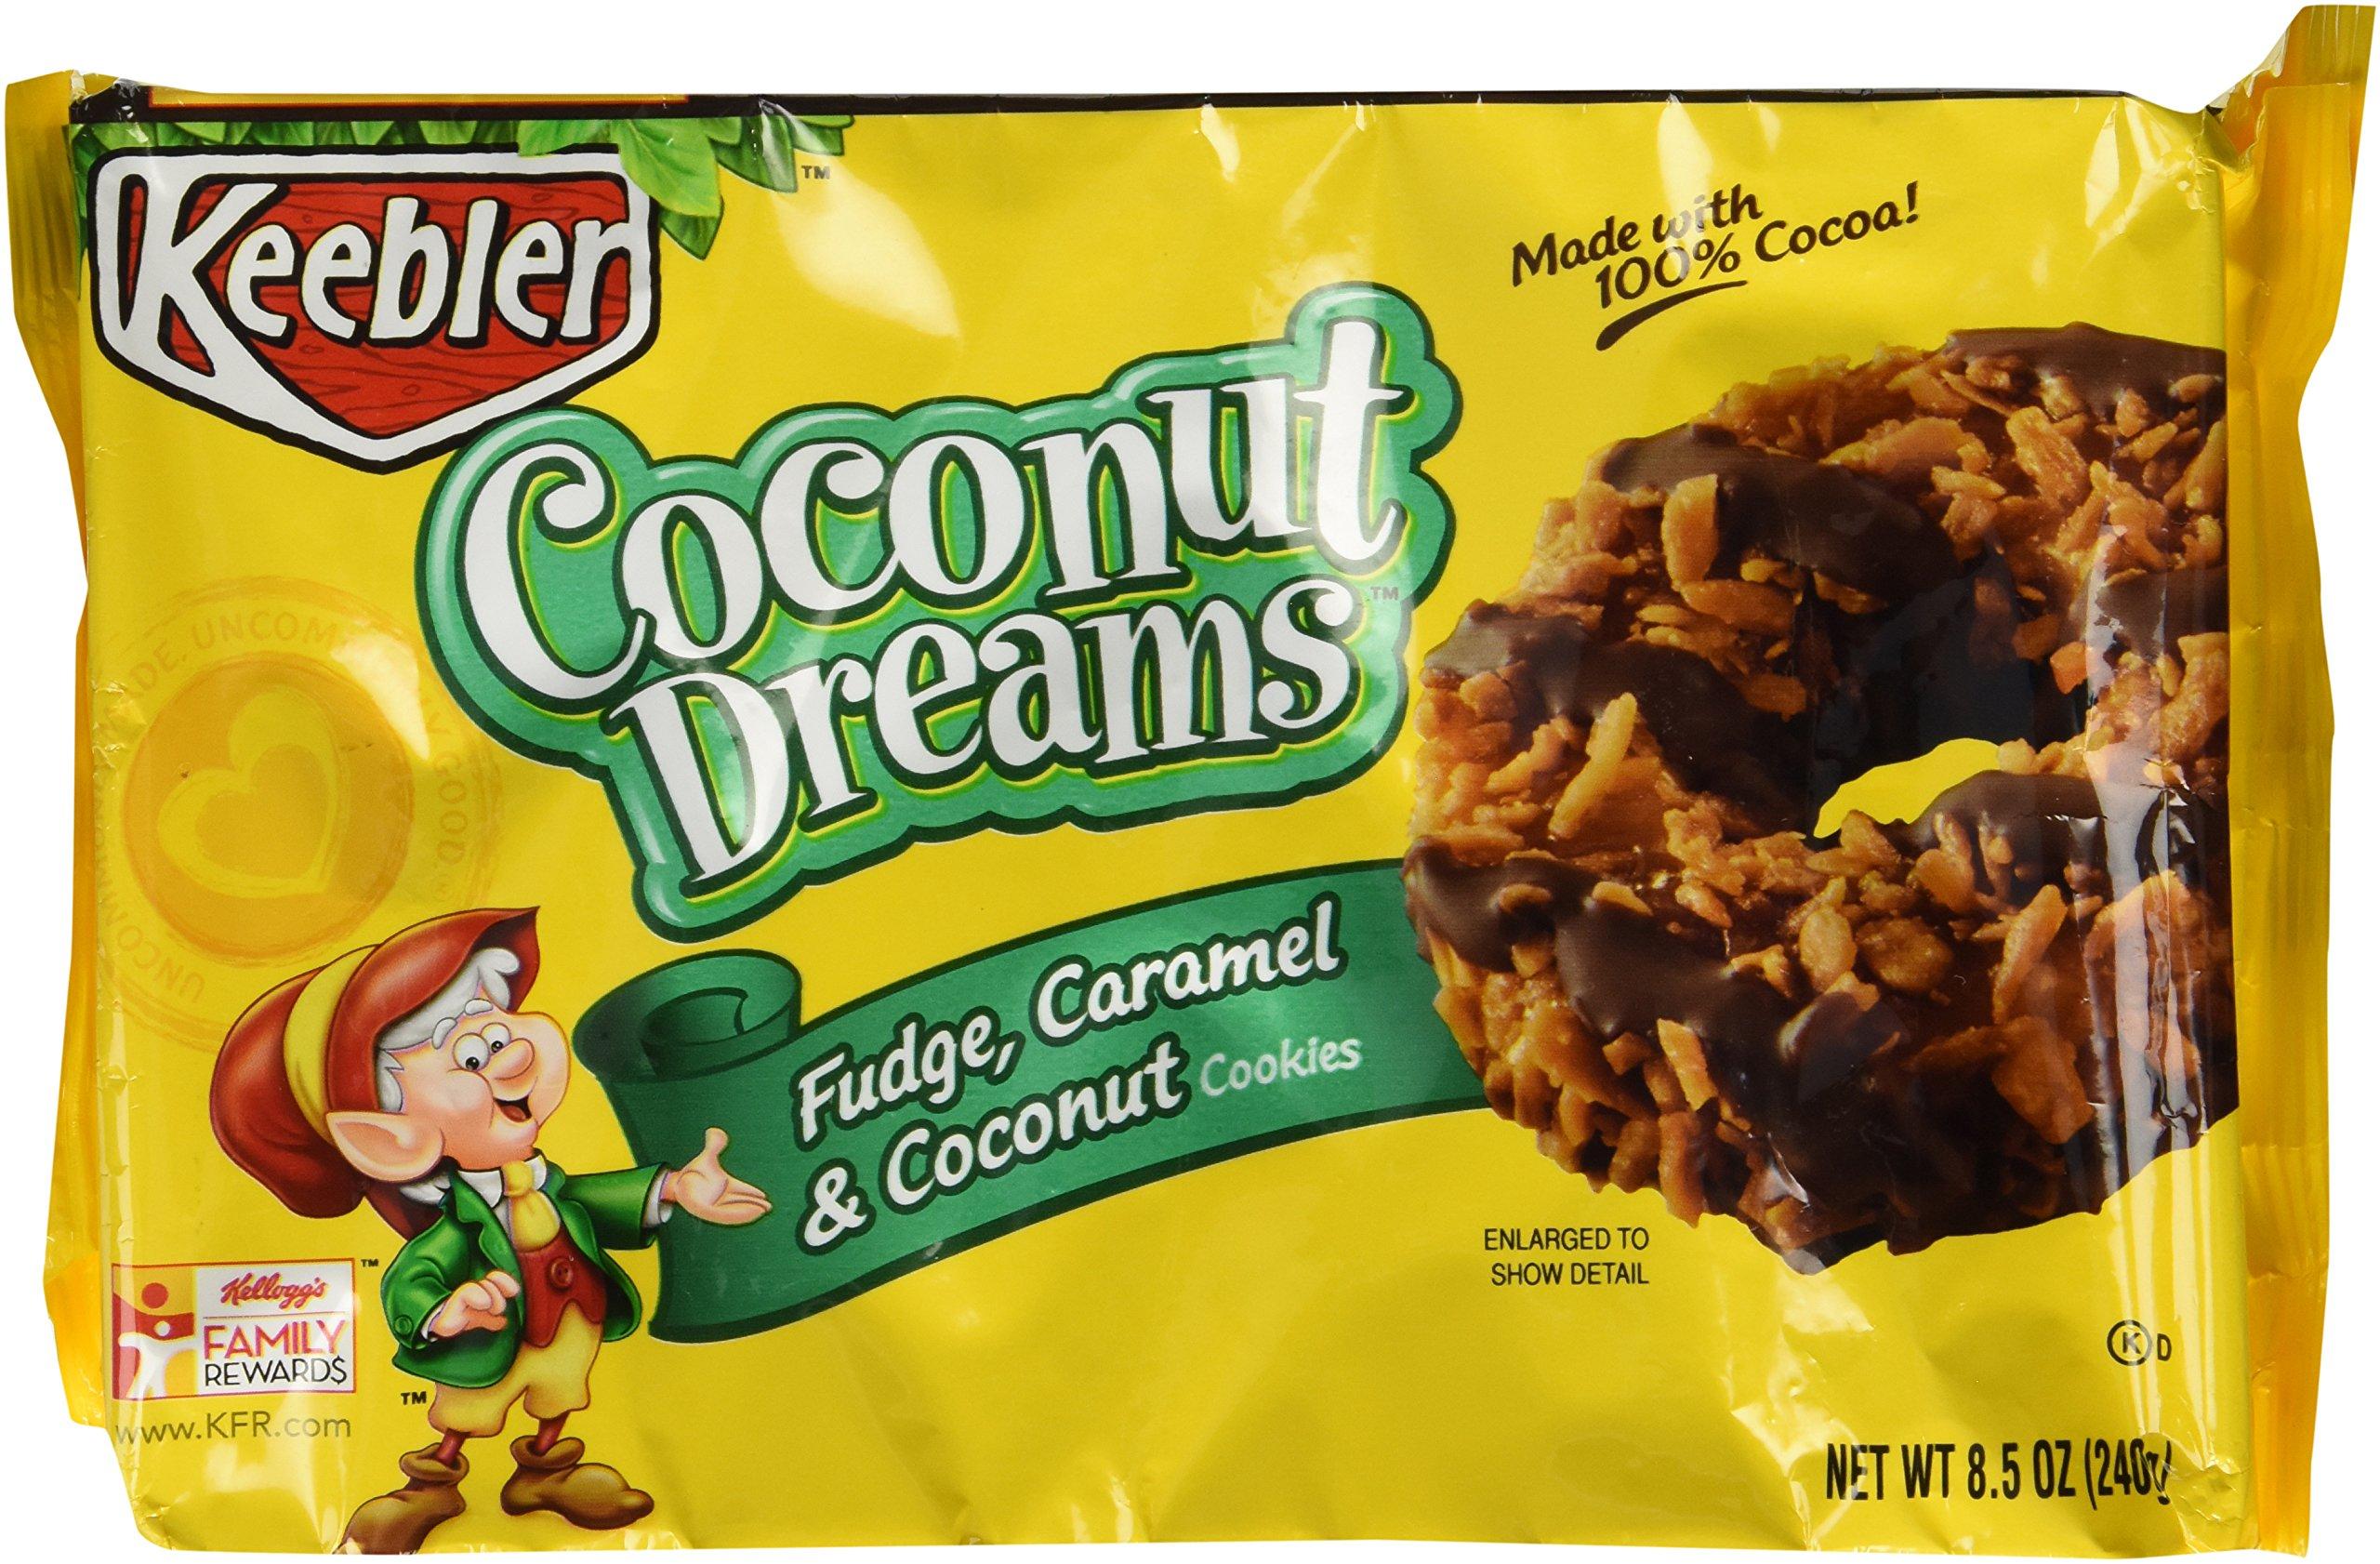 Keebler Fudge Shoppe Cookies, Coconut Dreams, 8.5 Ounce Package (Pack of 4)